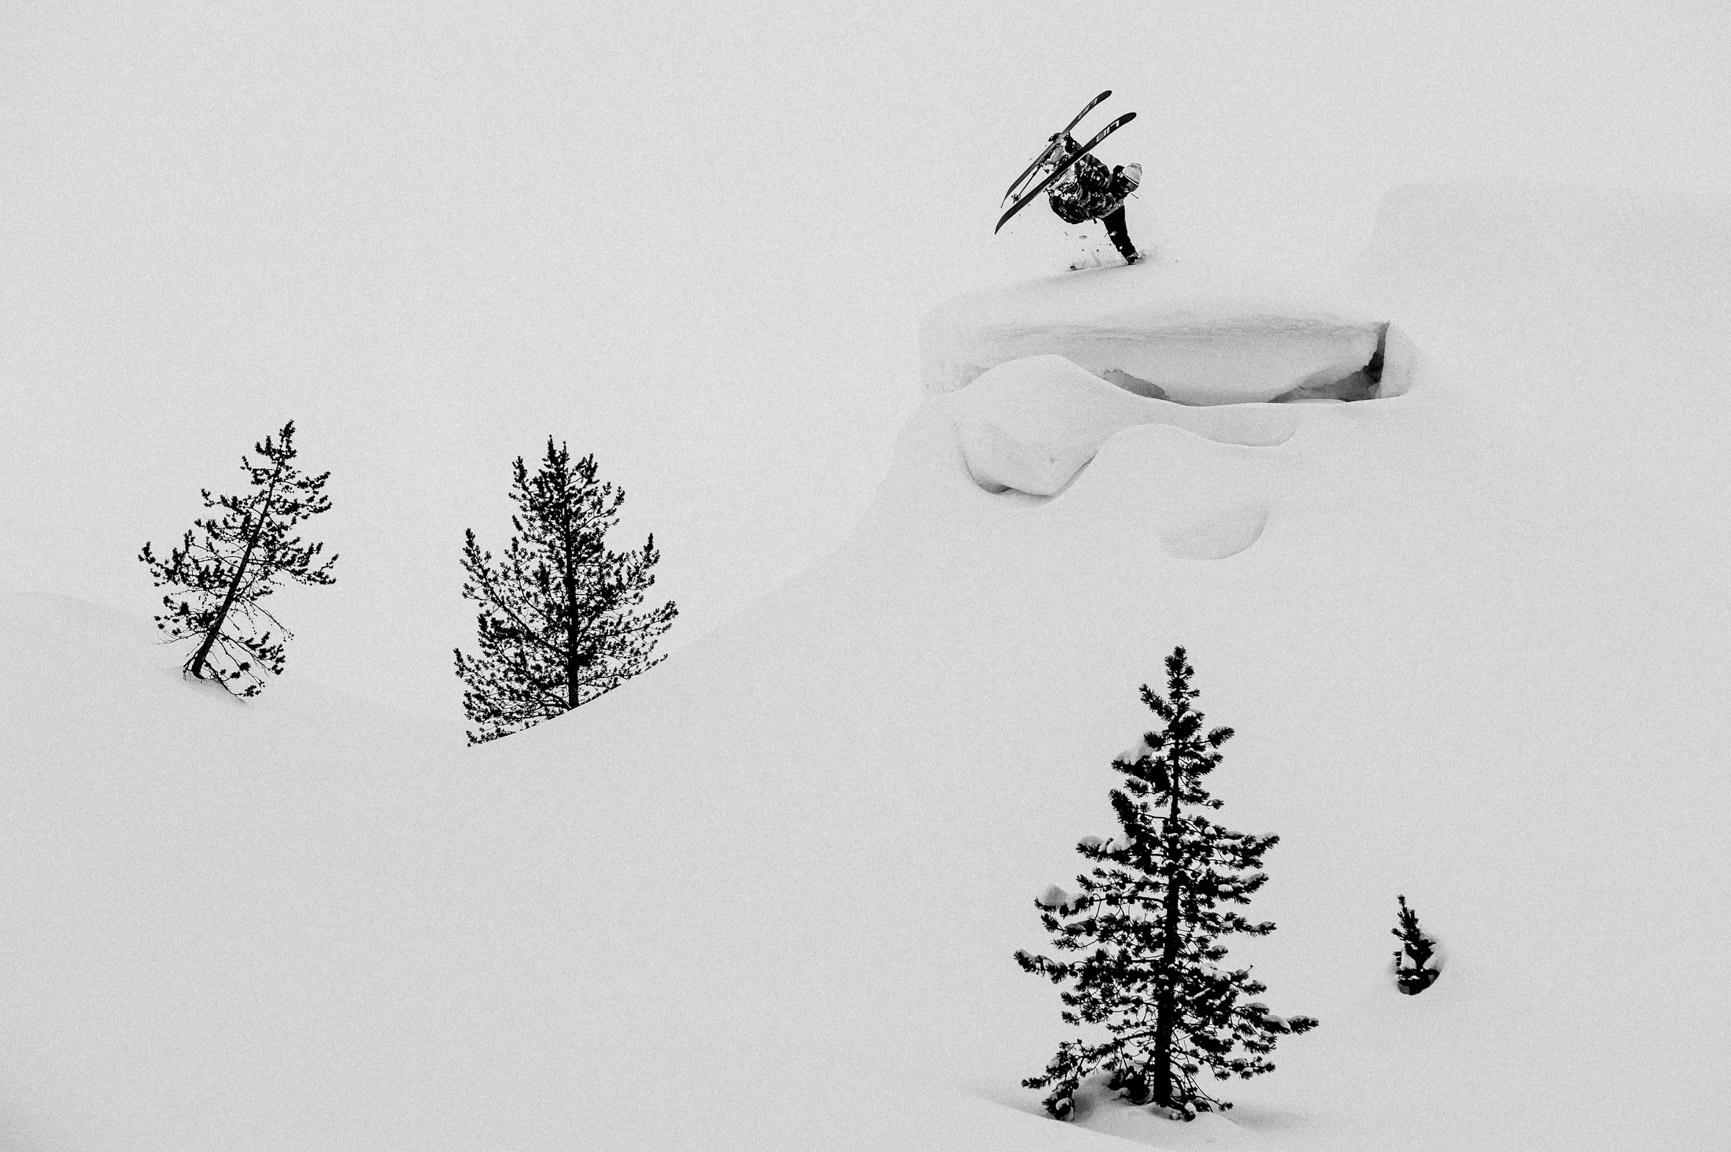 Lucas Wachs, Idaho